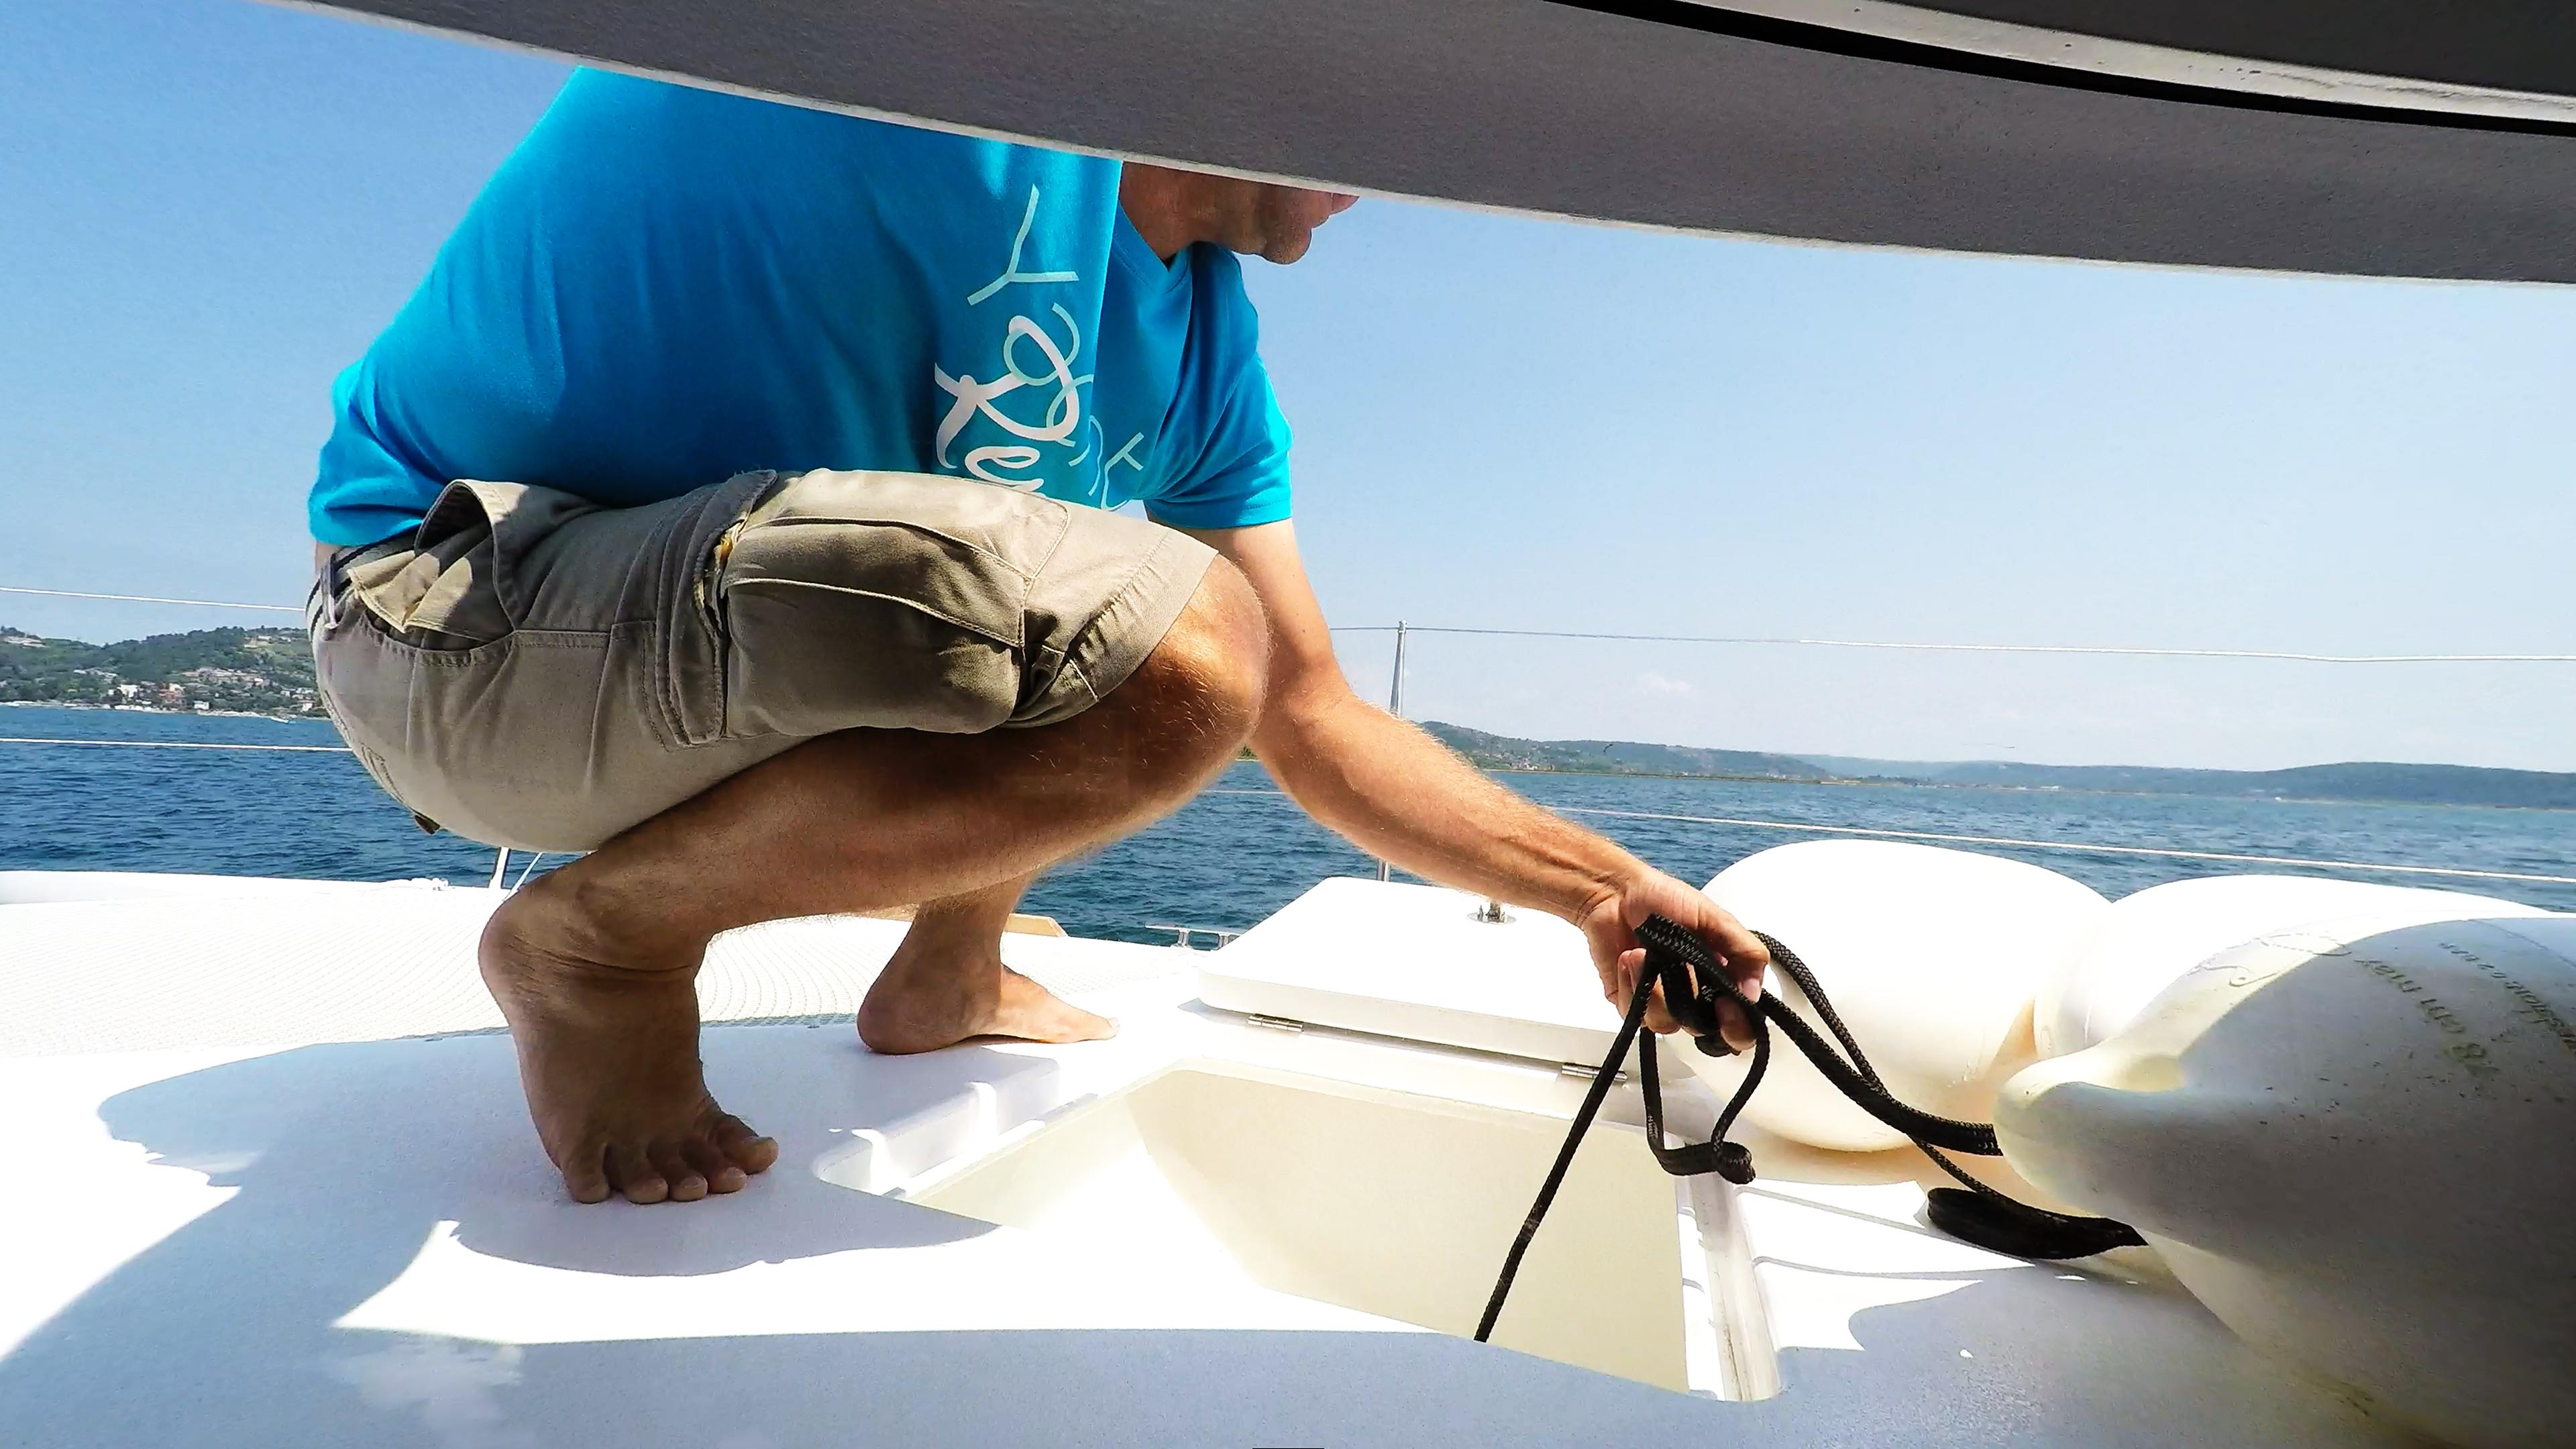 equipaggio member preparing fenders barca a vela